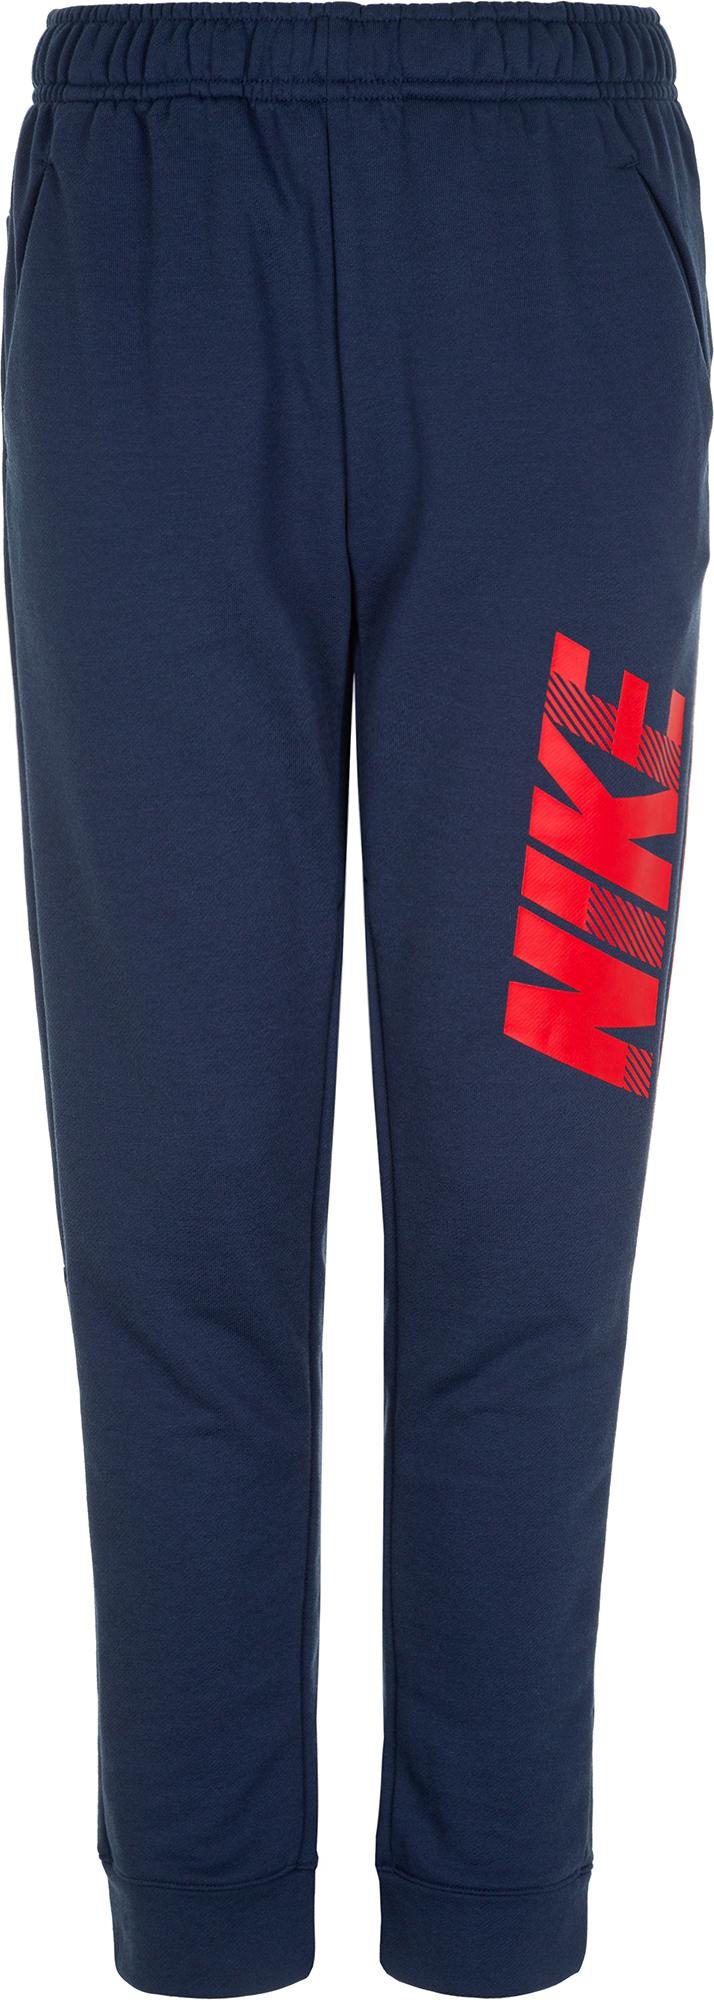 Nike Брюки для мальчиков Dry, размер 158-170